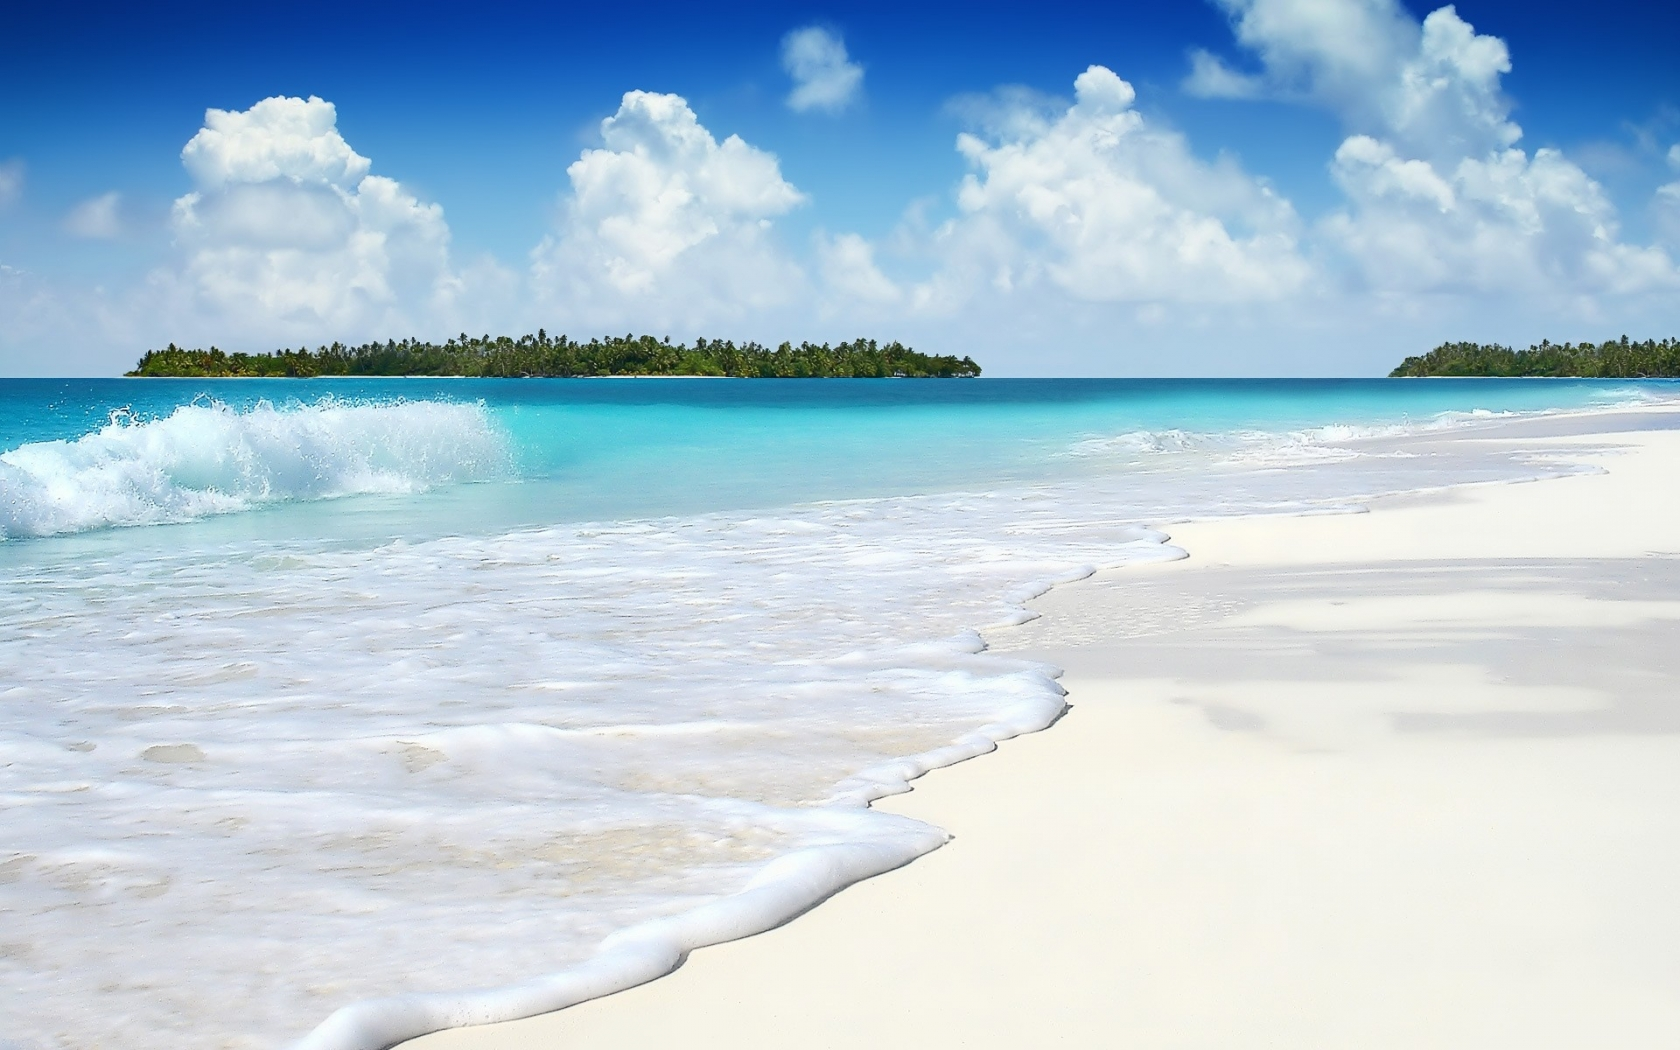 Hermosa playa - 1680x1050